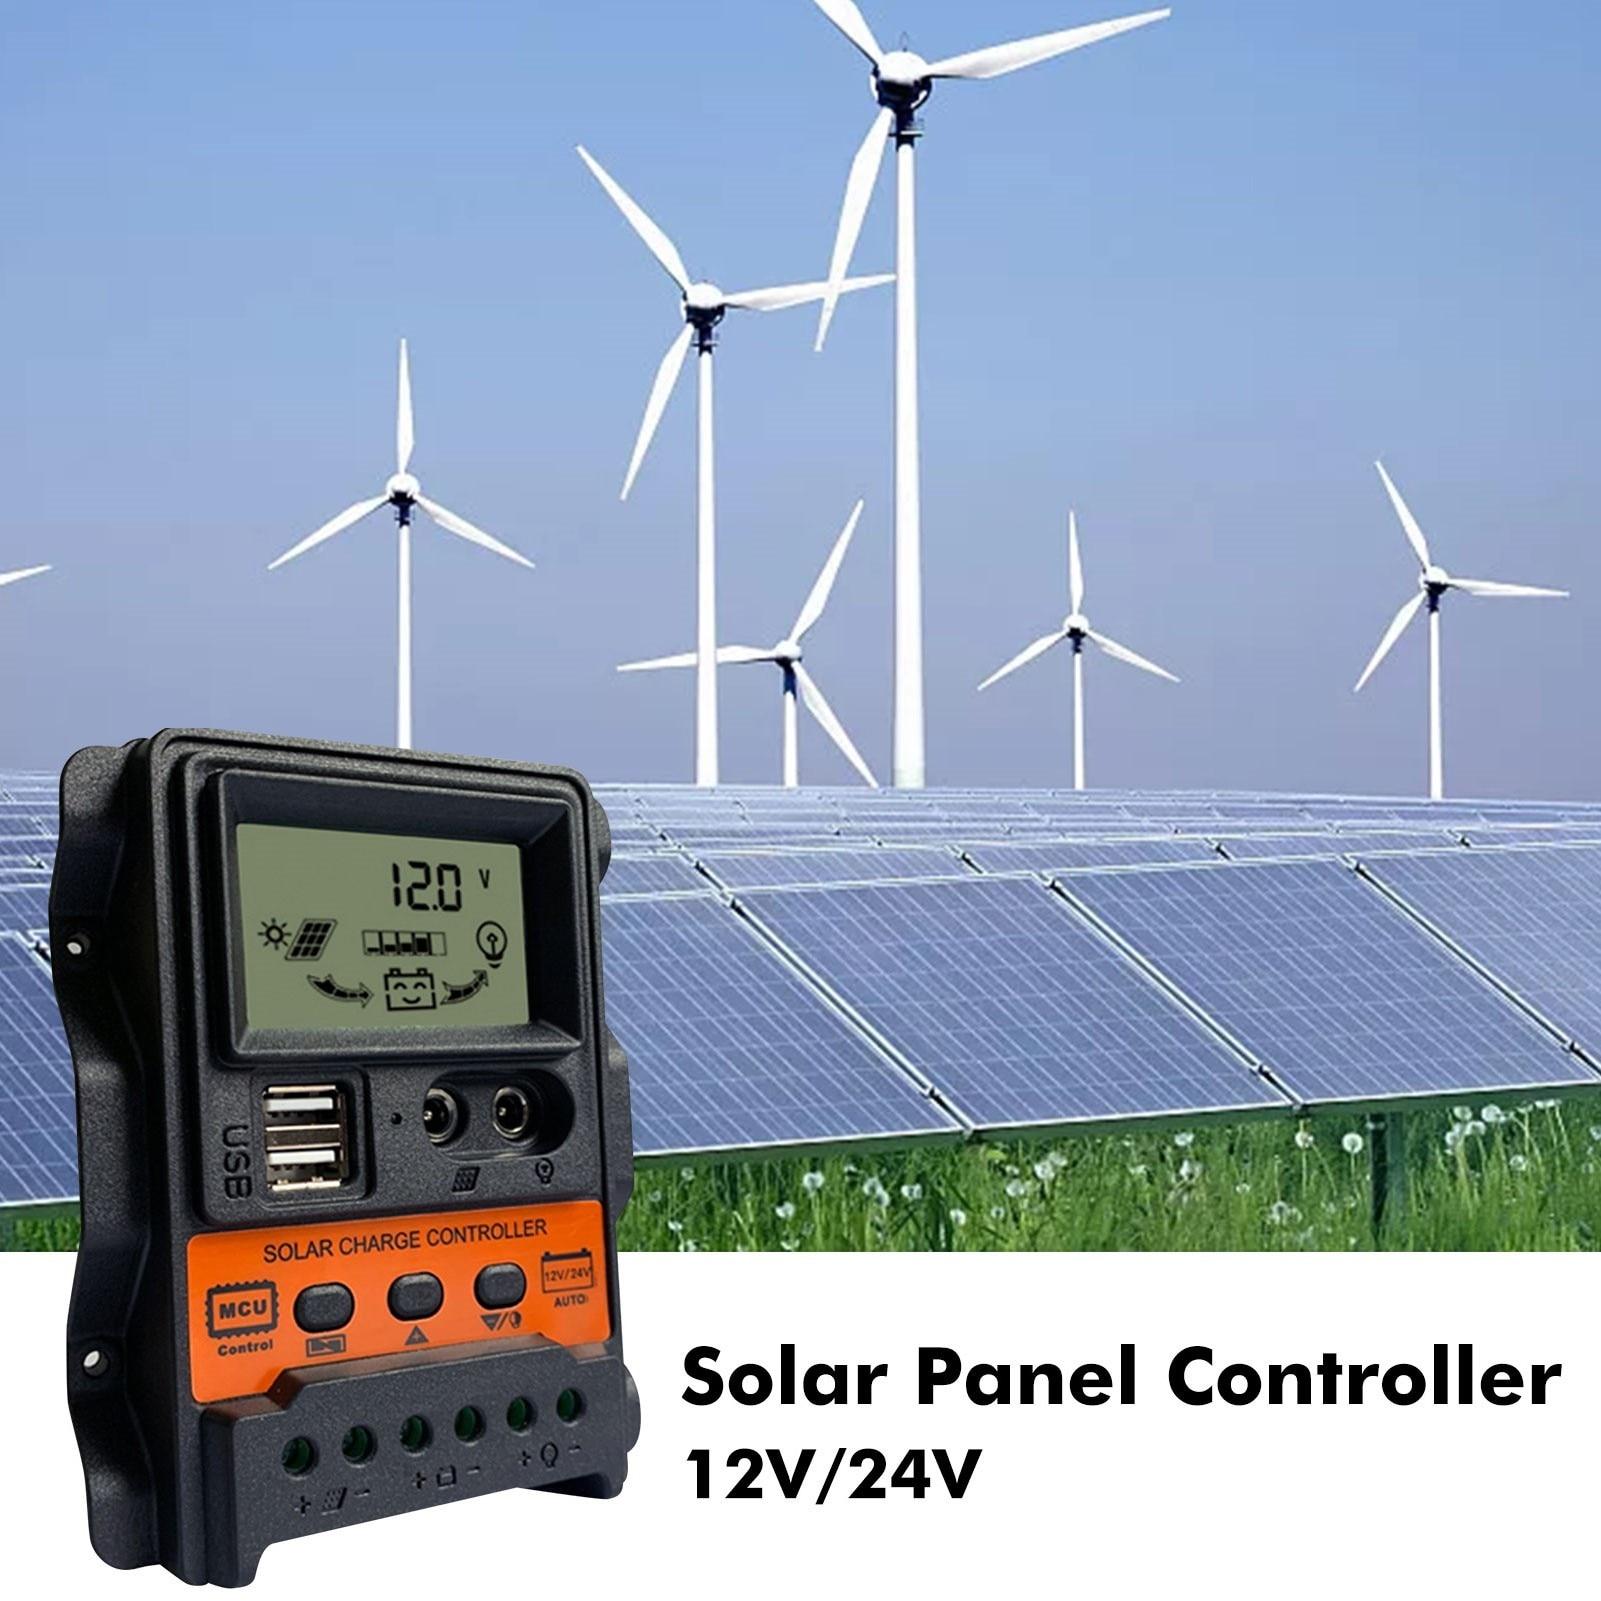 Solar Charge Controller 12V/24V LCD Backlight Display Solar Battery Regulator Dual USB Output Controllers